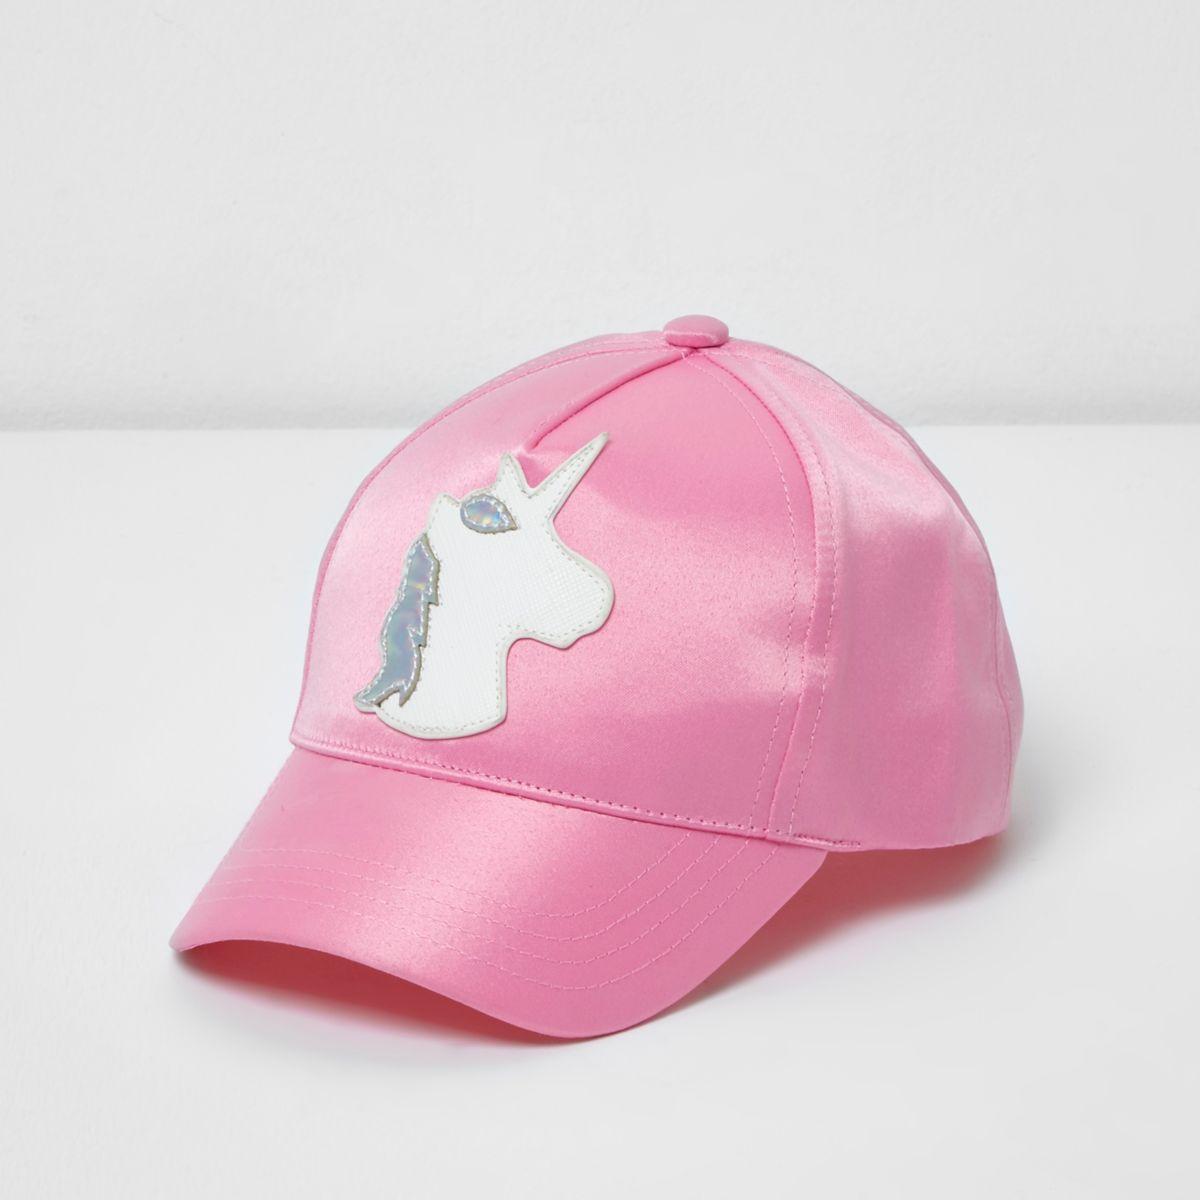 Casquette motif licorne en satin rose mini fille